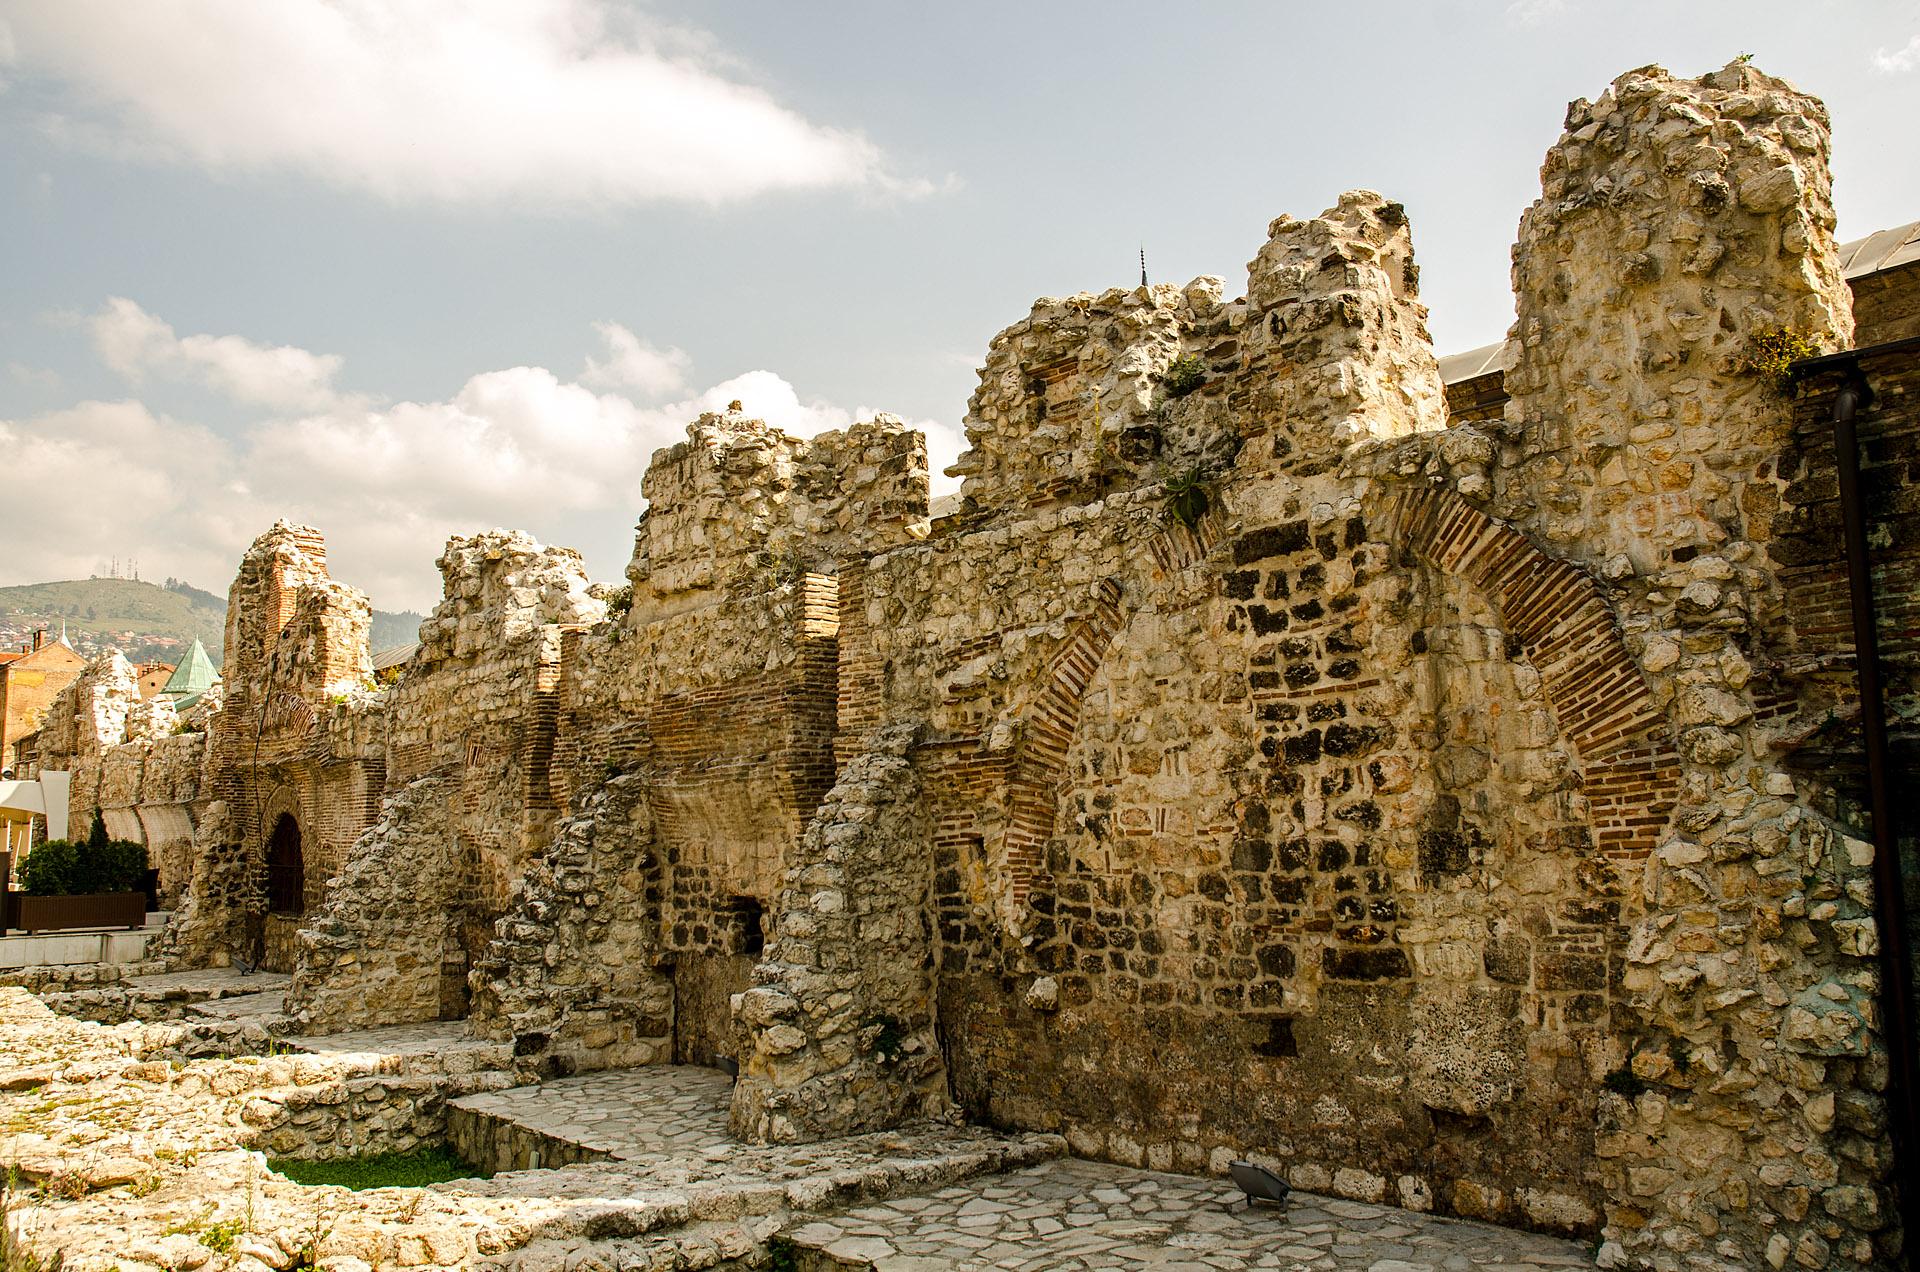 Taslihan ruins (historic inn, c. 1540)